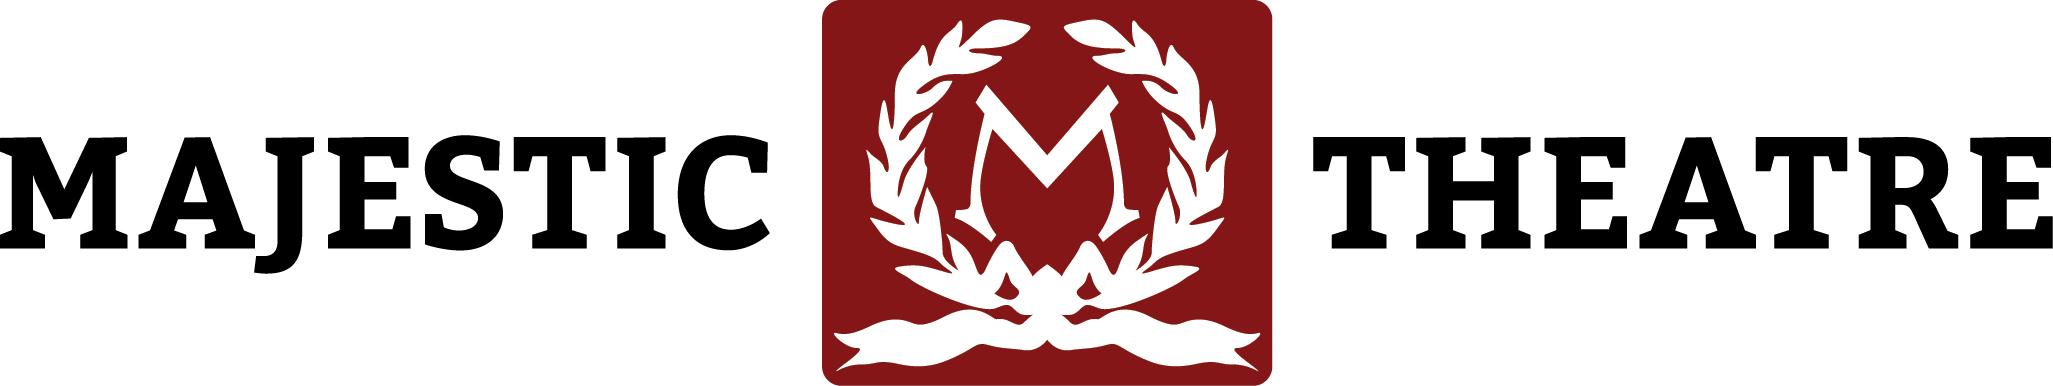 Majestic_1x5_color 1